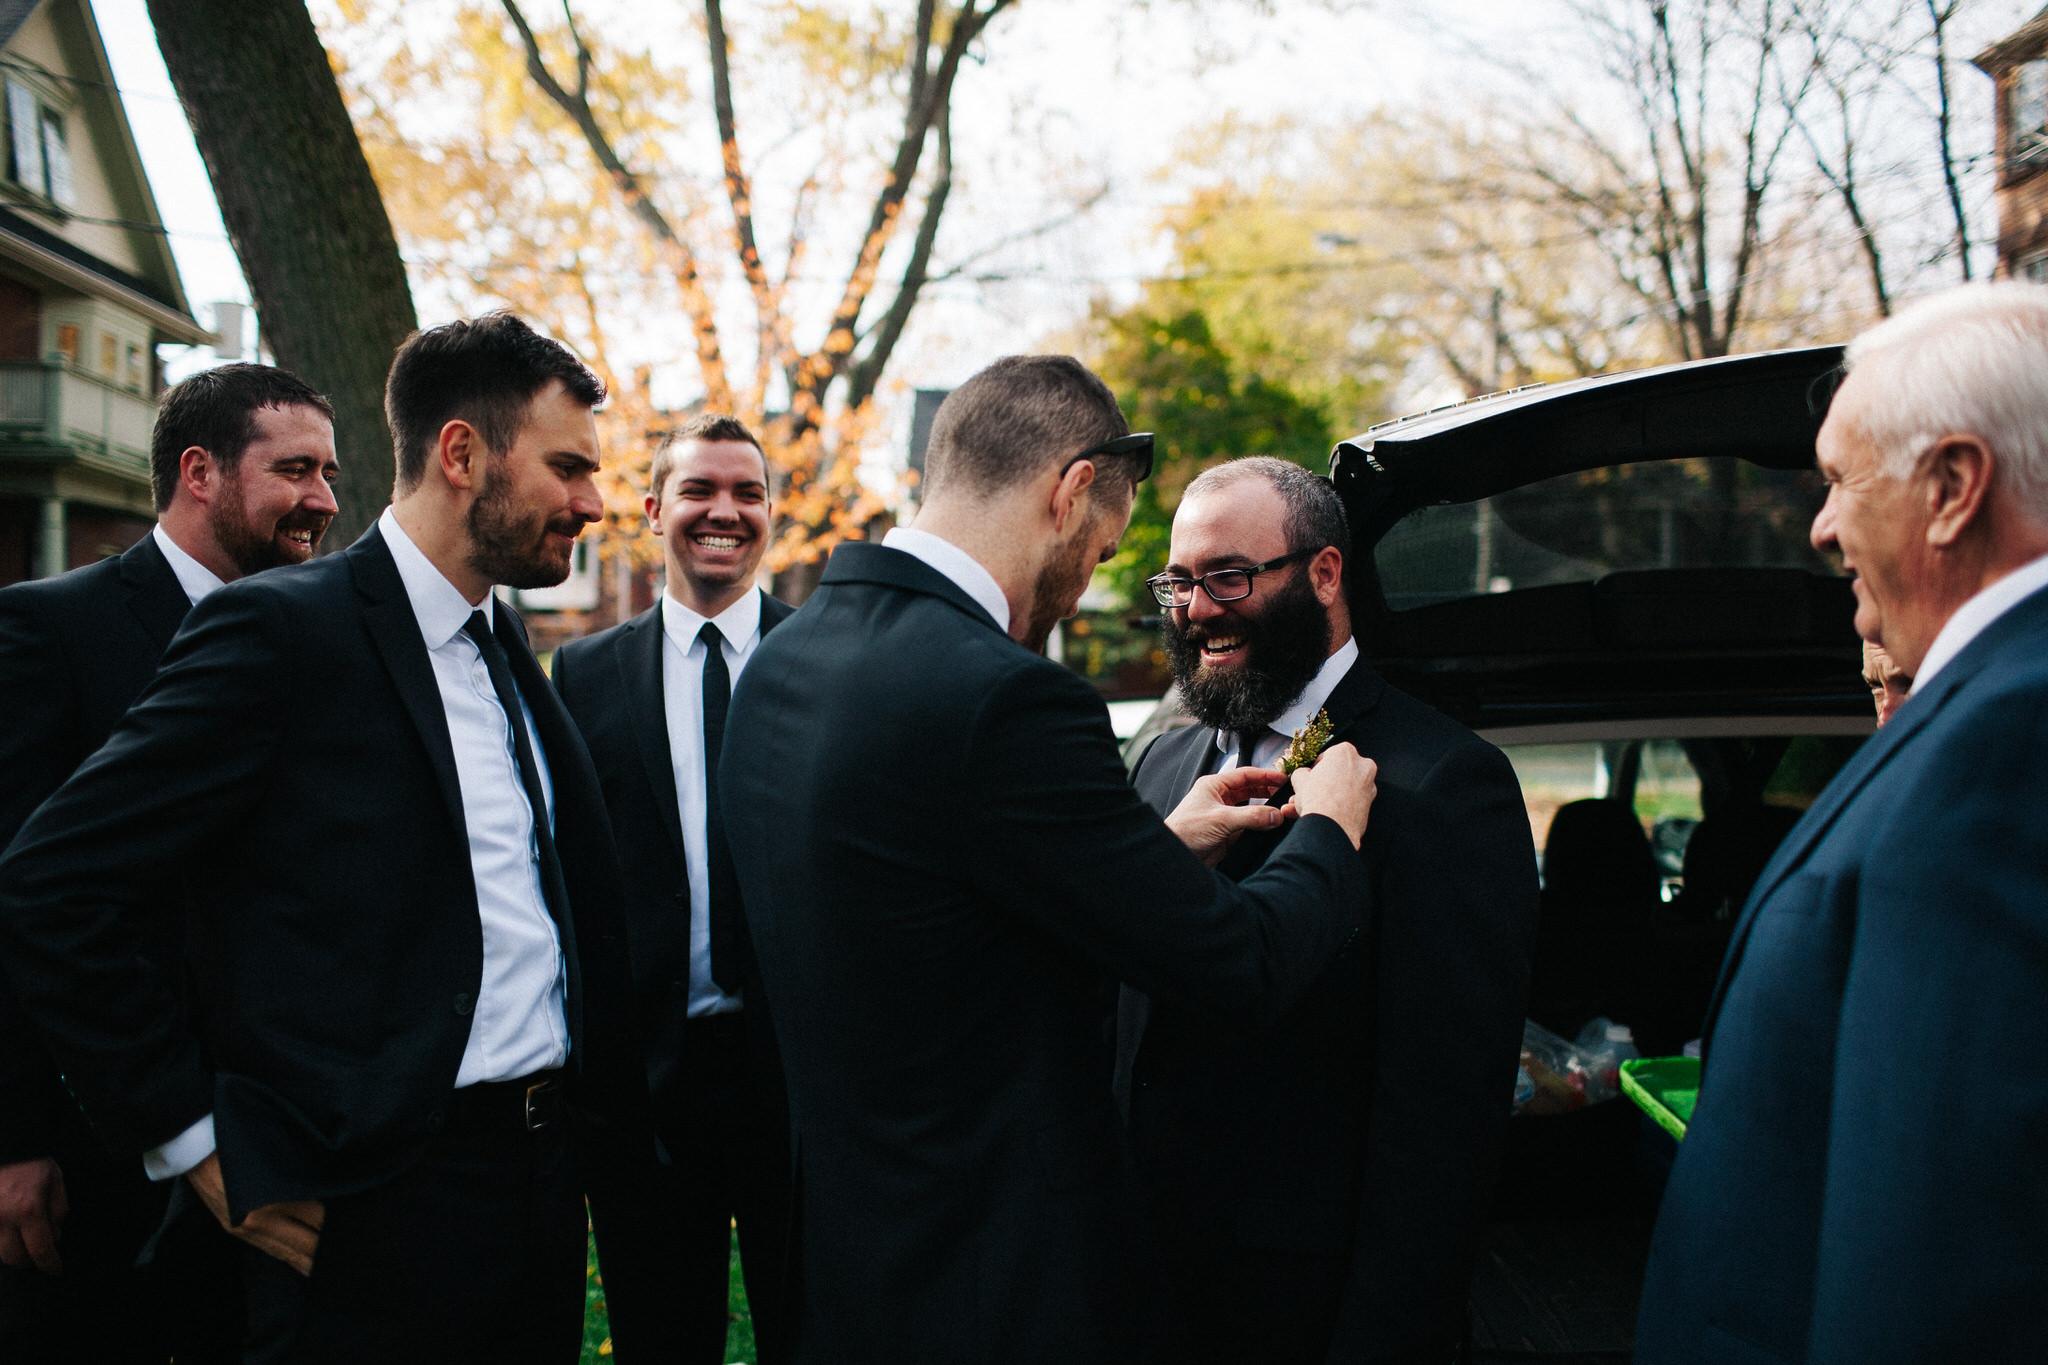 groomsmen getting dressed, groom photos, toronto wedding photographer, documentary wedding photographer, berkeley church wedding